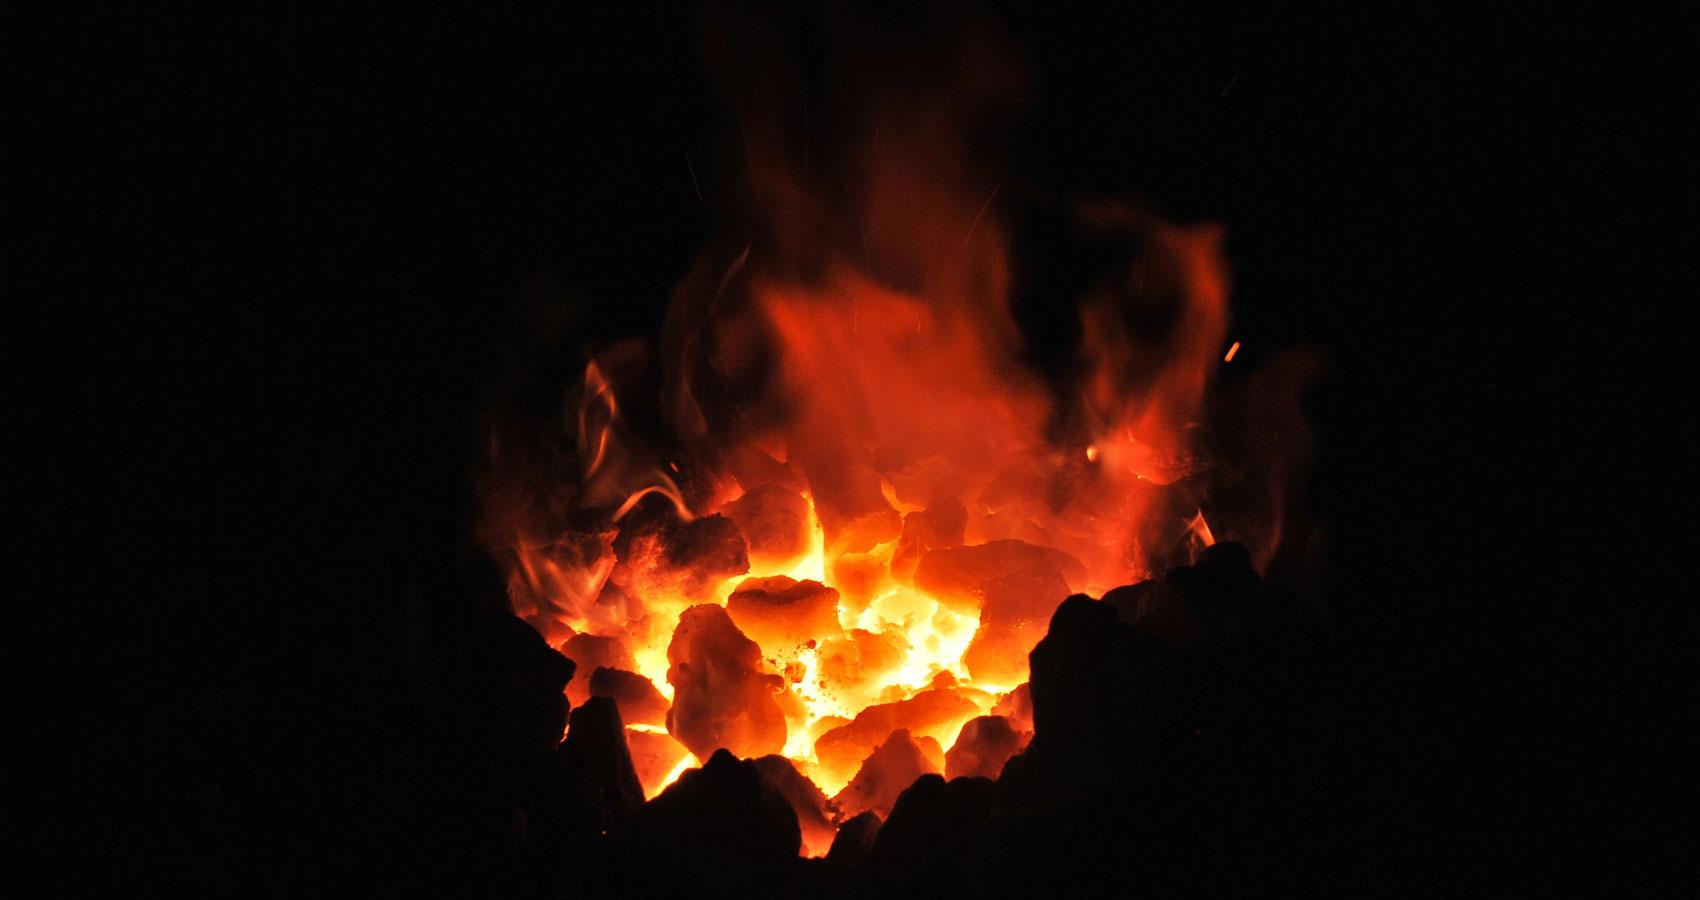 On Fire, a haiku poem written by Trevor Graham at Spillwords.com